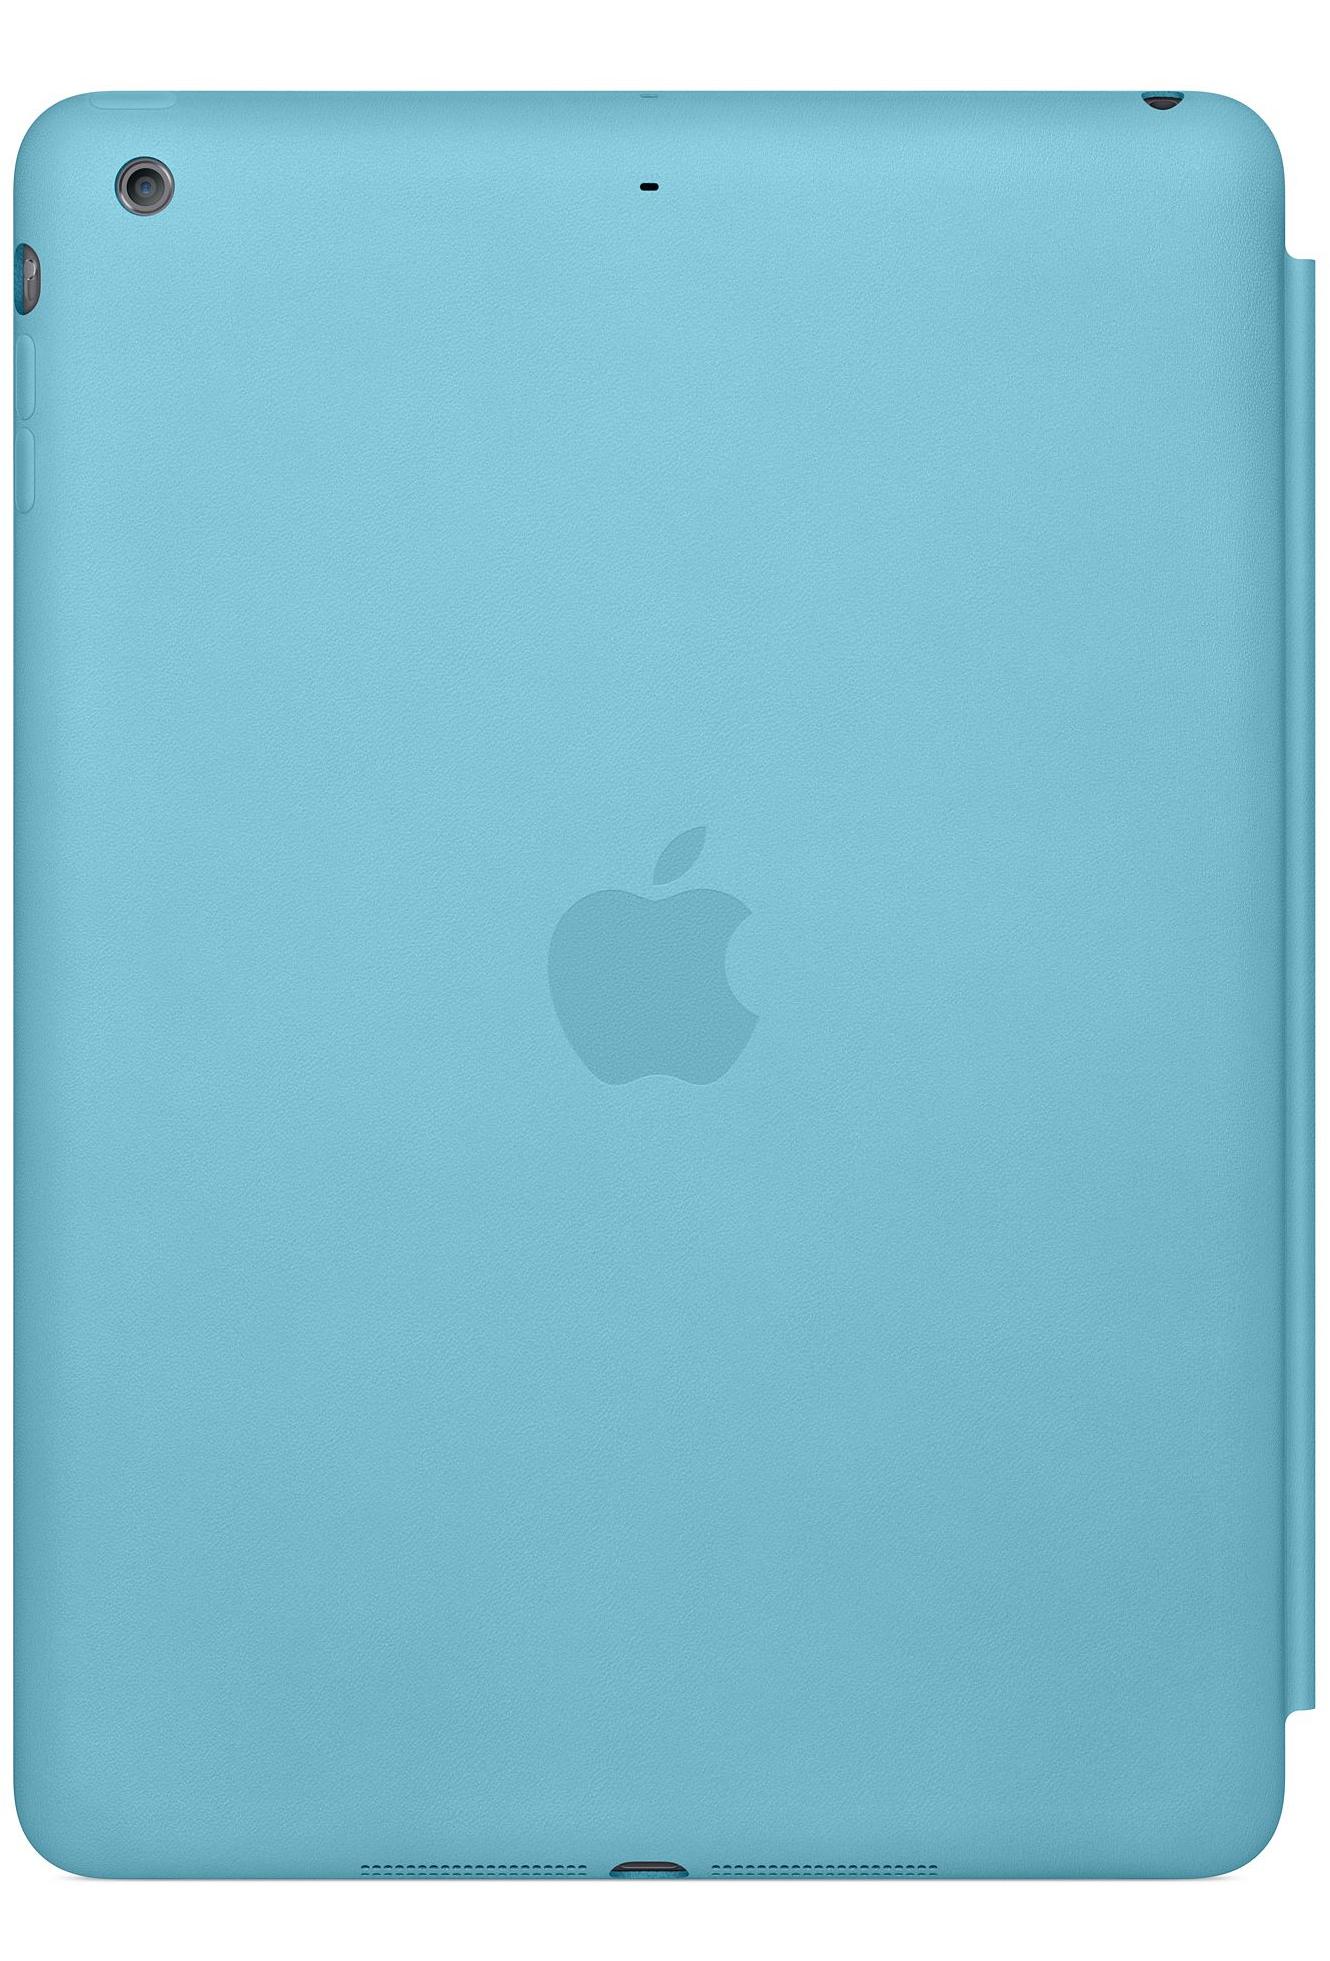 Smart Case azul para iPad Air